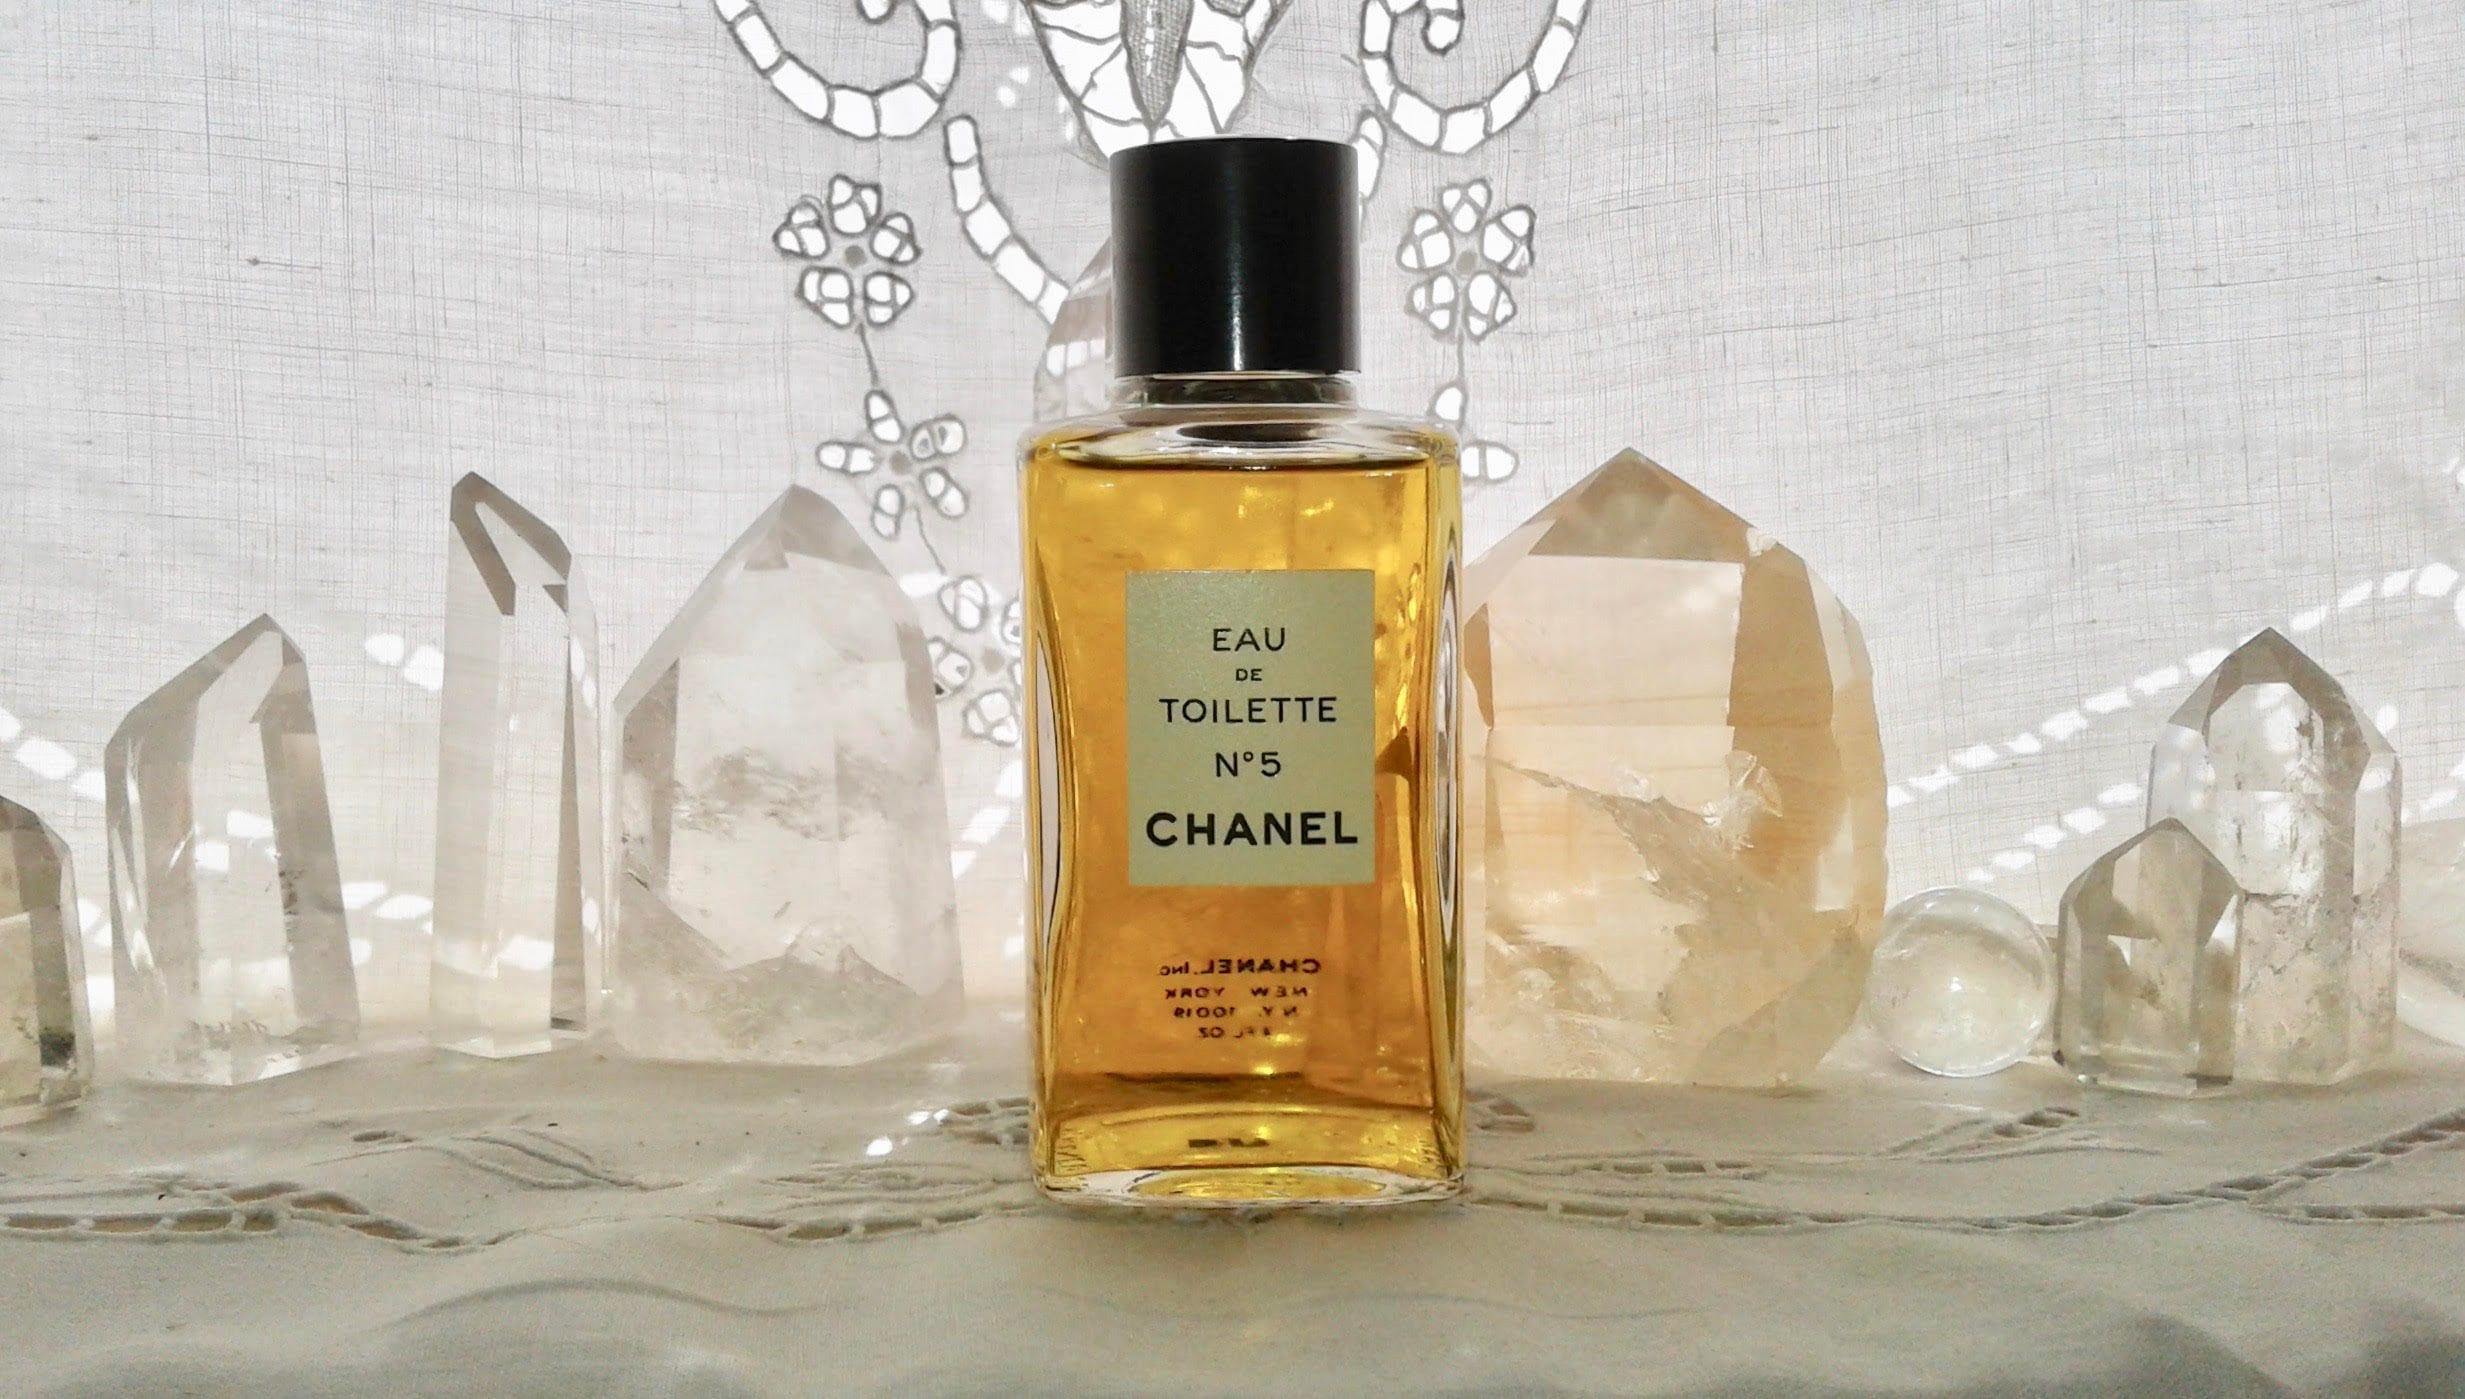 Chanel No 5 120 Ml Or 4 Oz Flacon Eau De Toilette 1921 Etsy